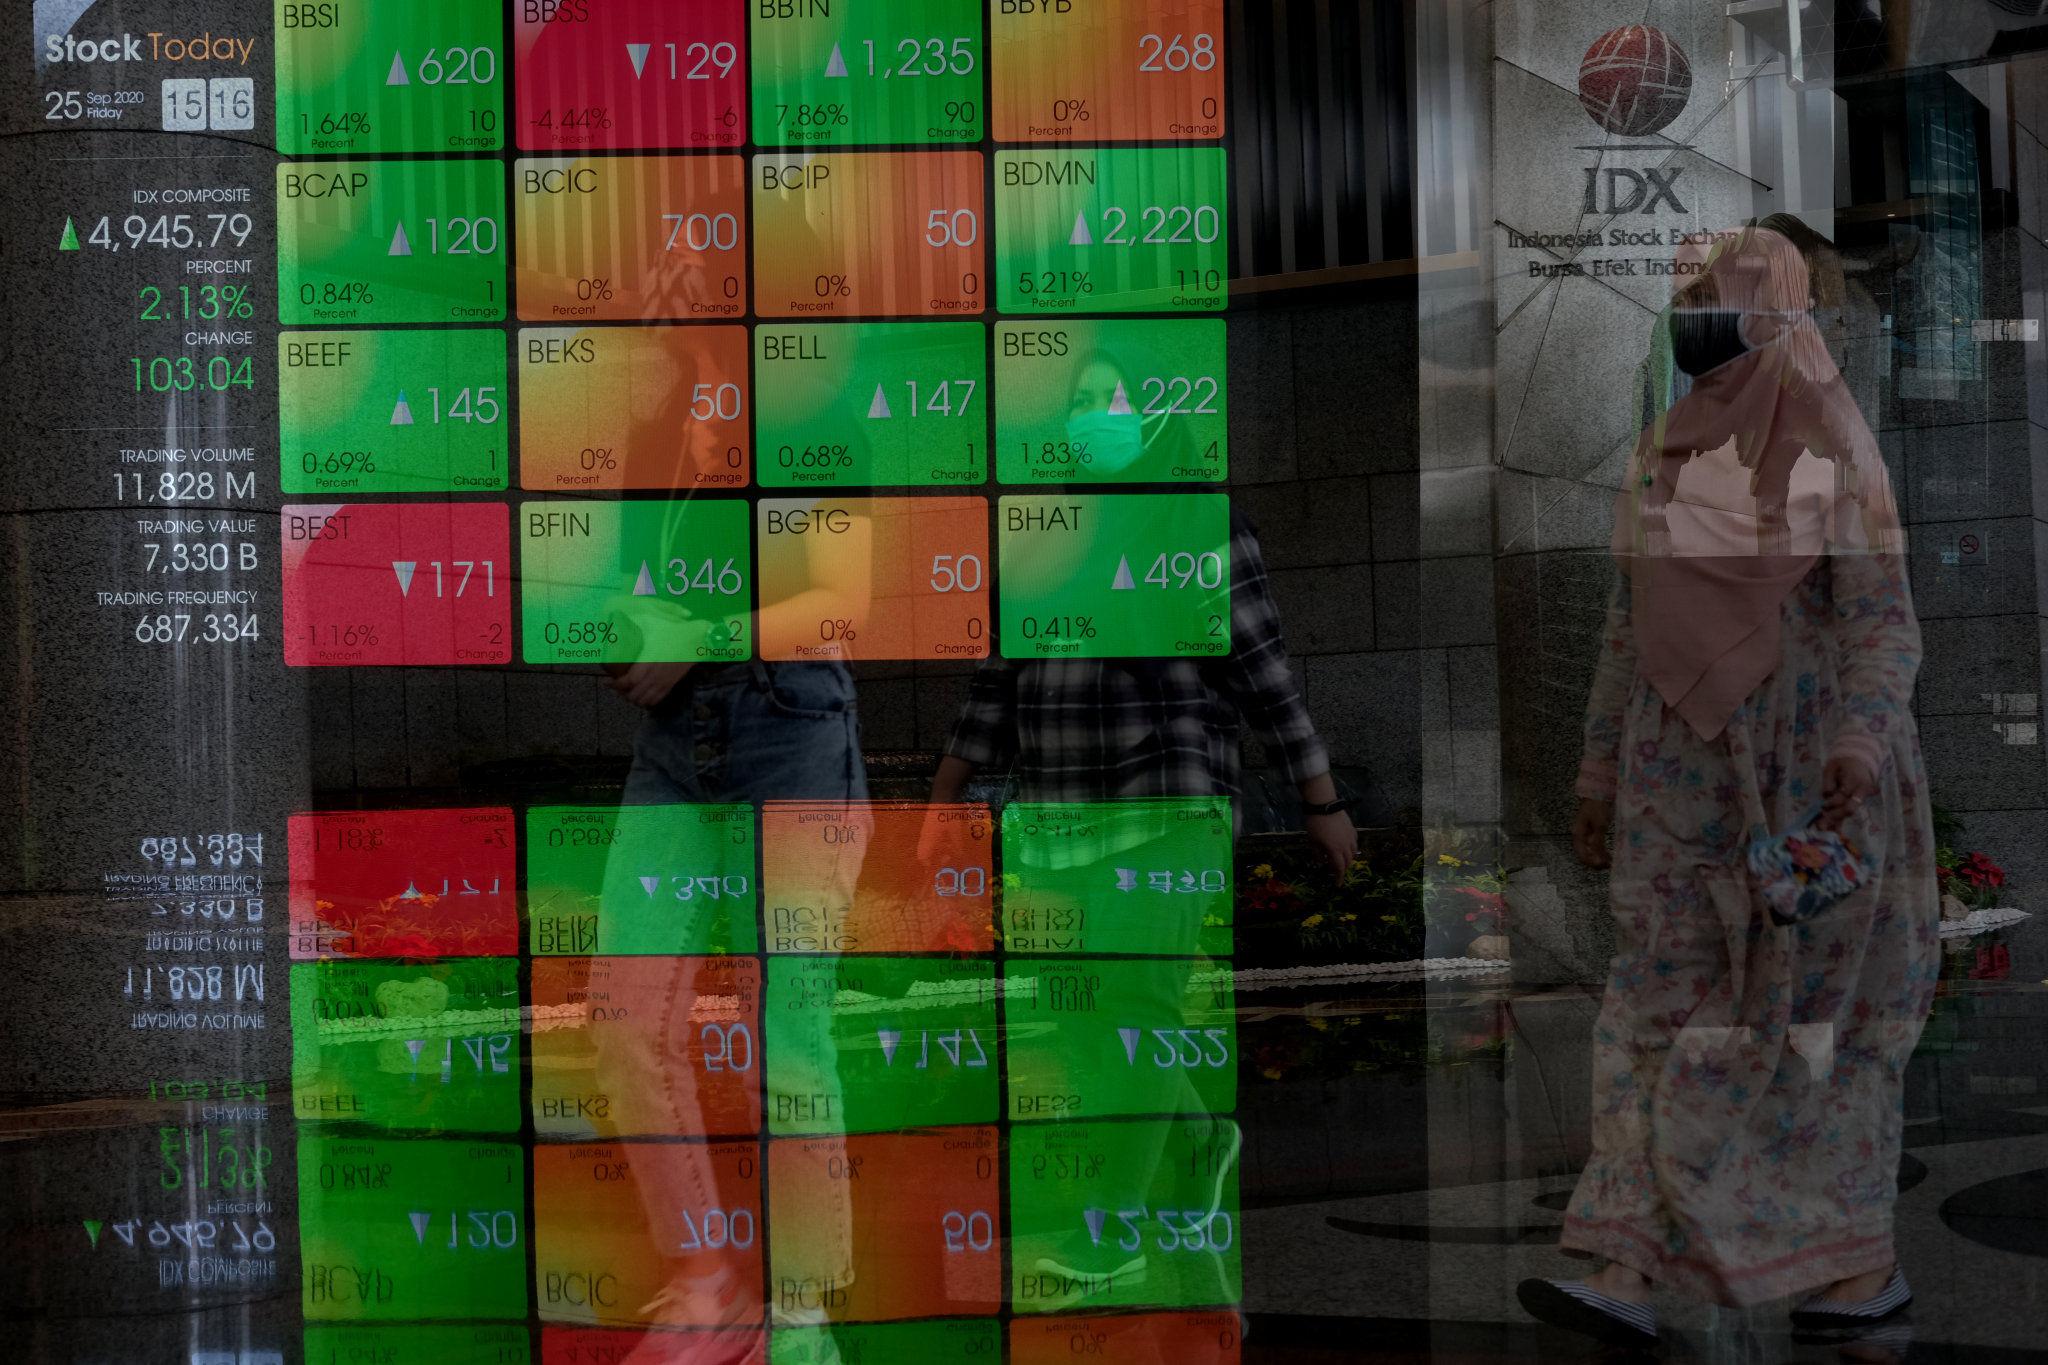 Dear Investor, Tower Bersama (TBIG) Resmi Rilis Obligasi Rp1,2 Triliun